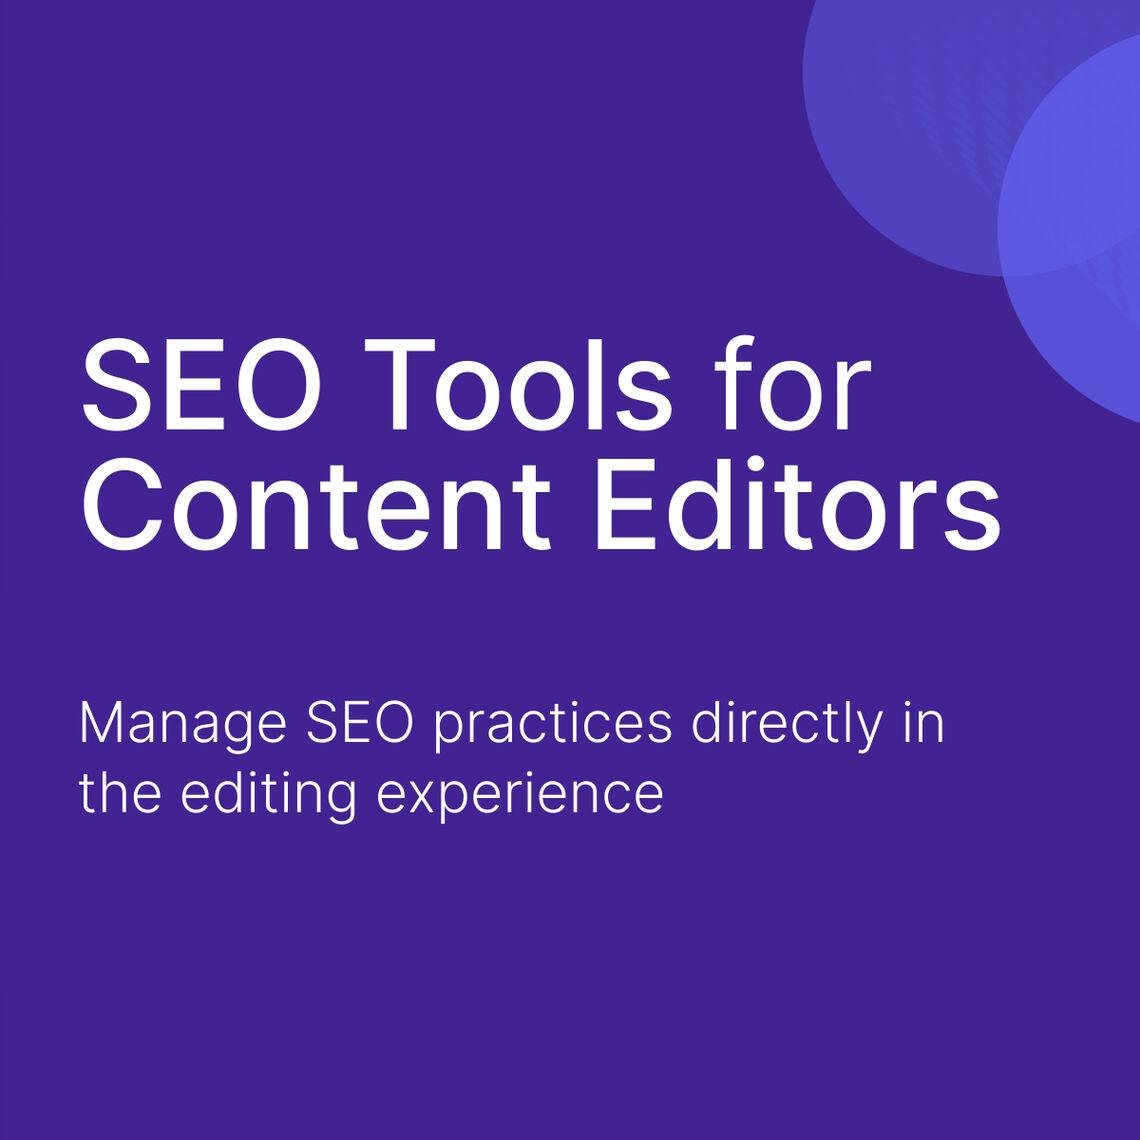 seo tools article thumbnail image